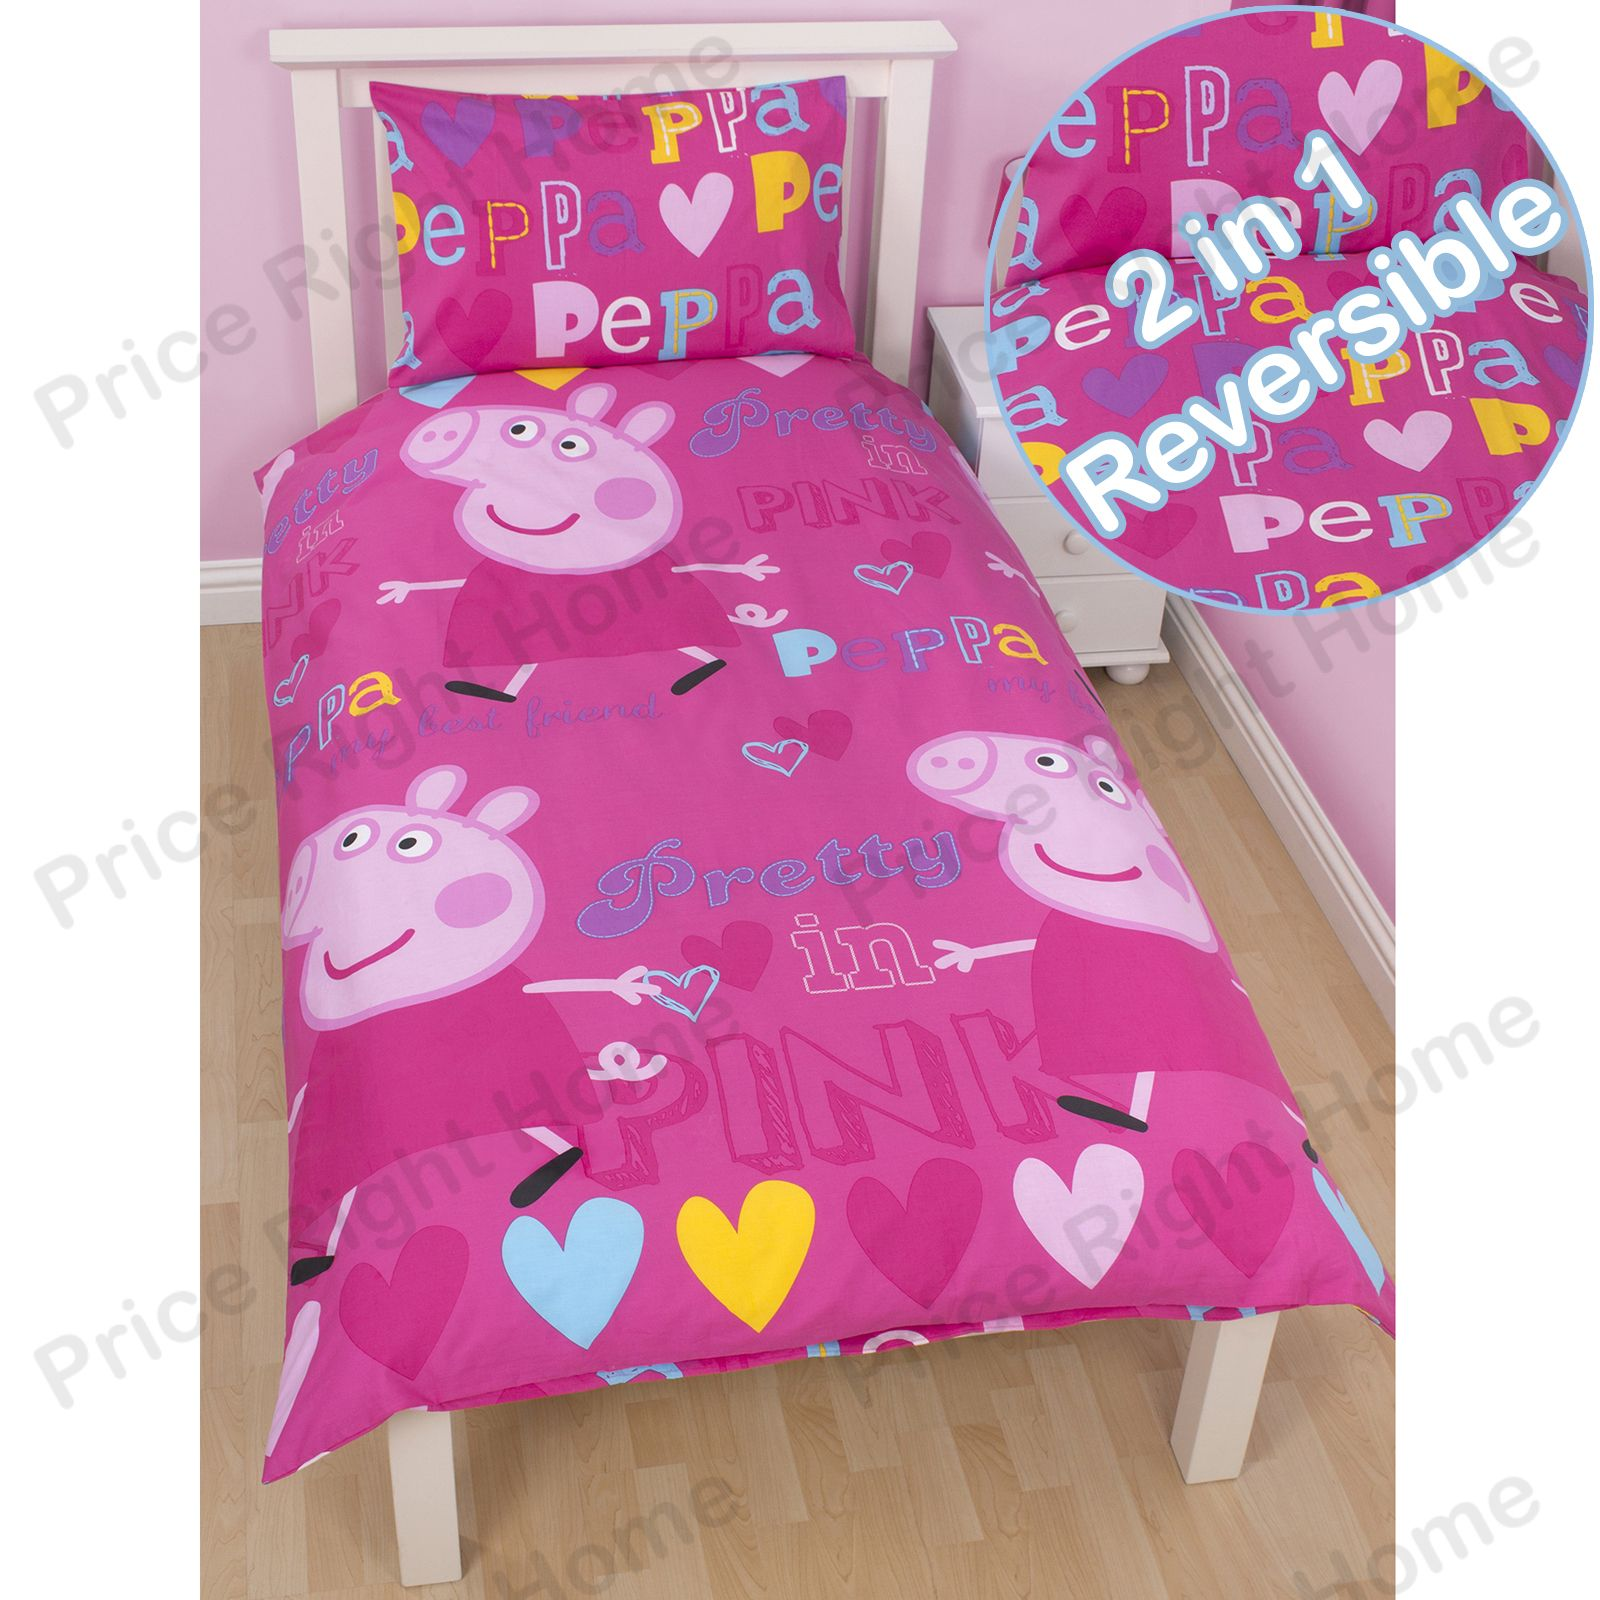 Peppa Pig Amp George Pig Duvet Quilt Covers Toddler